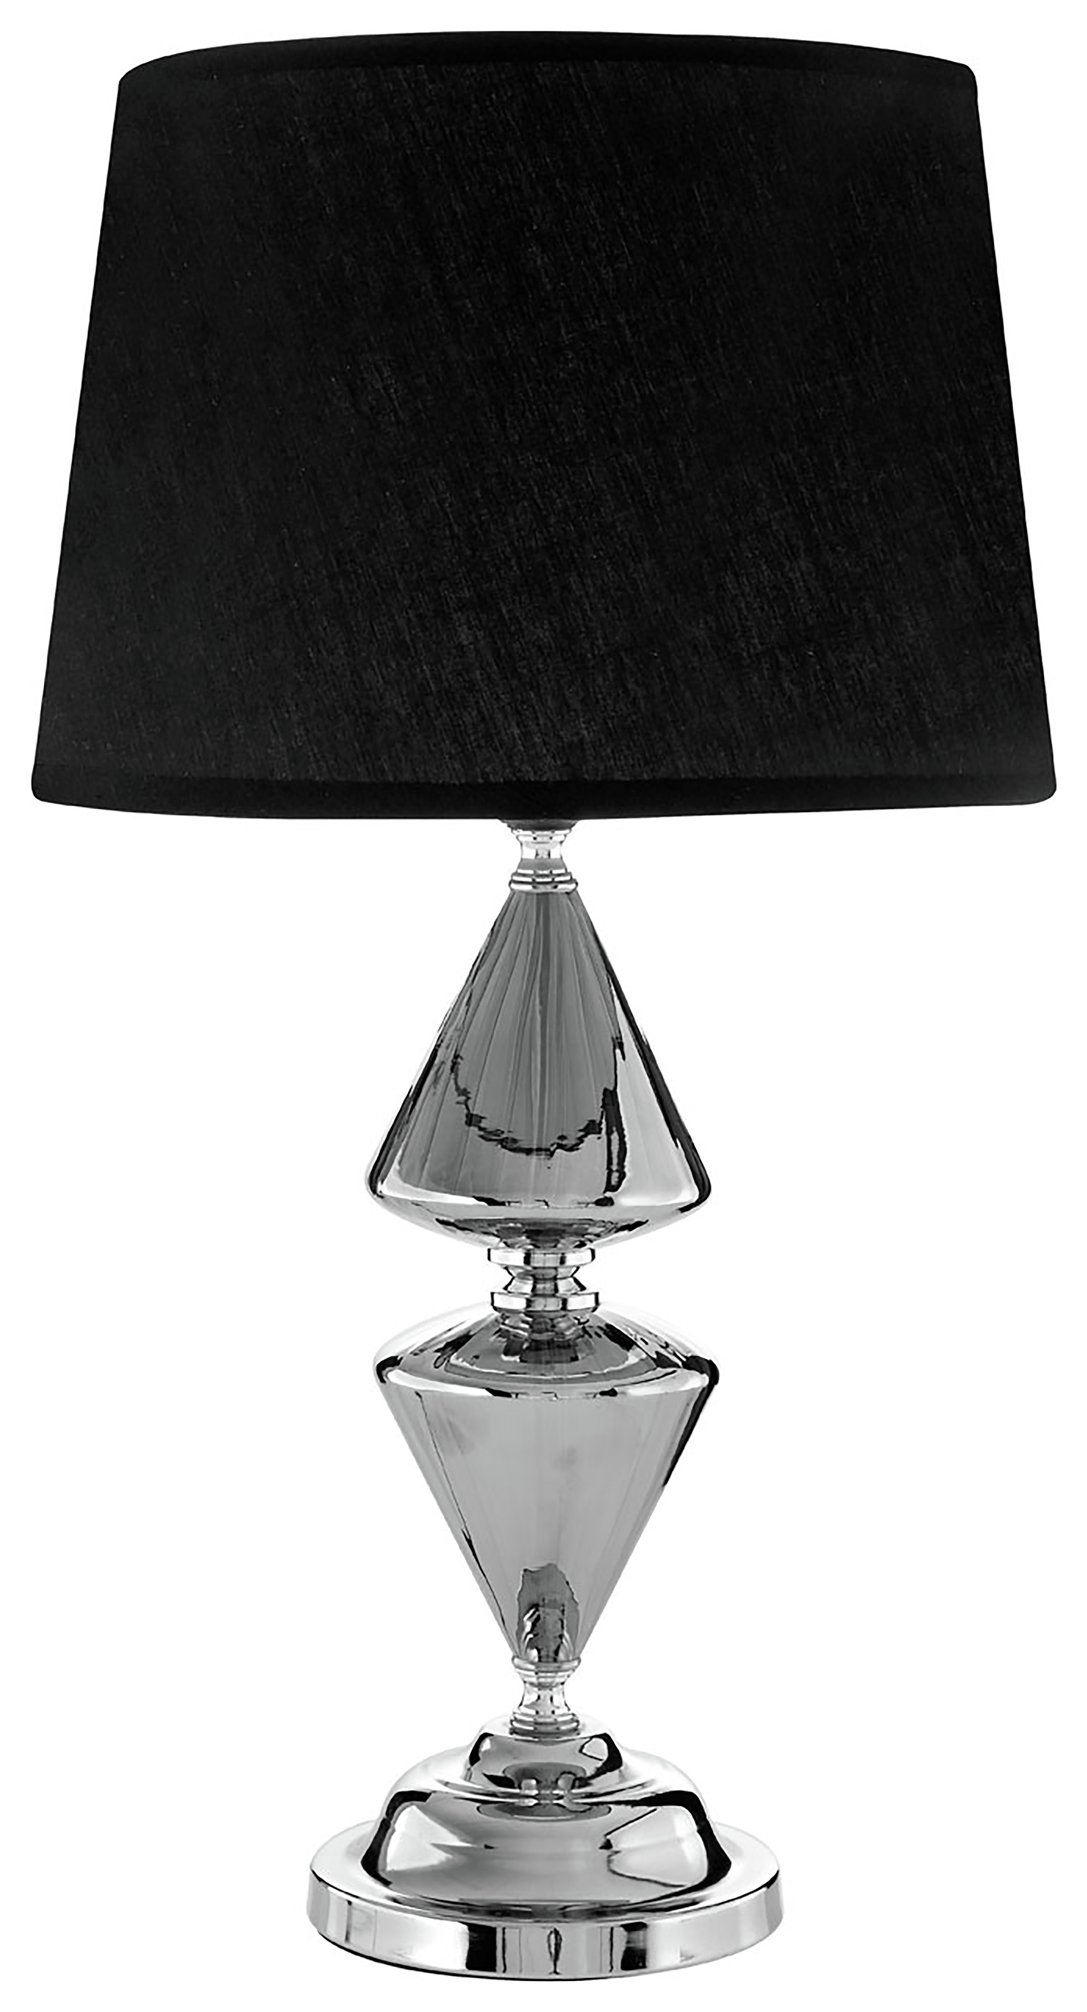 Image of Honor Glass & Metal - Table Lamp - Black